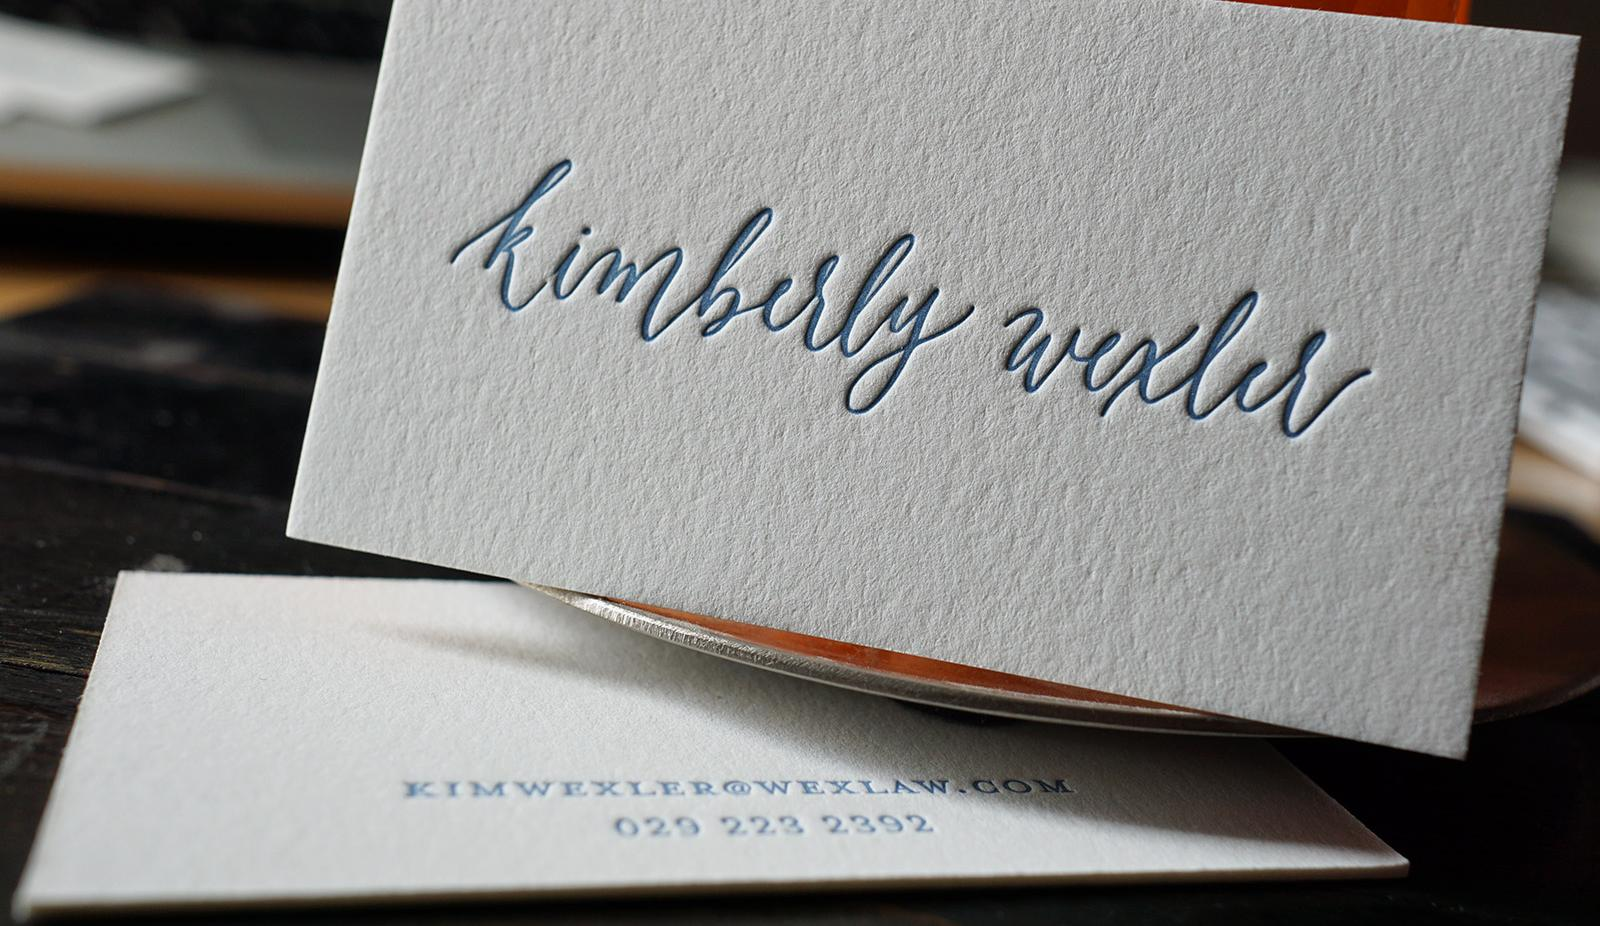 Letterpress Business Cards - Business Card Tips